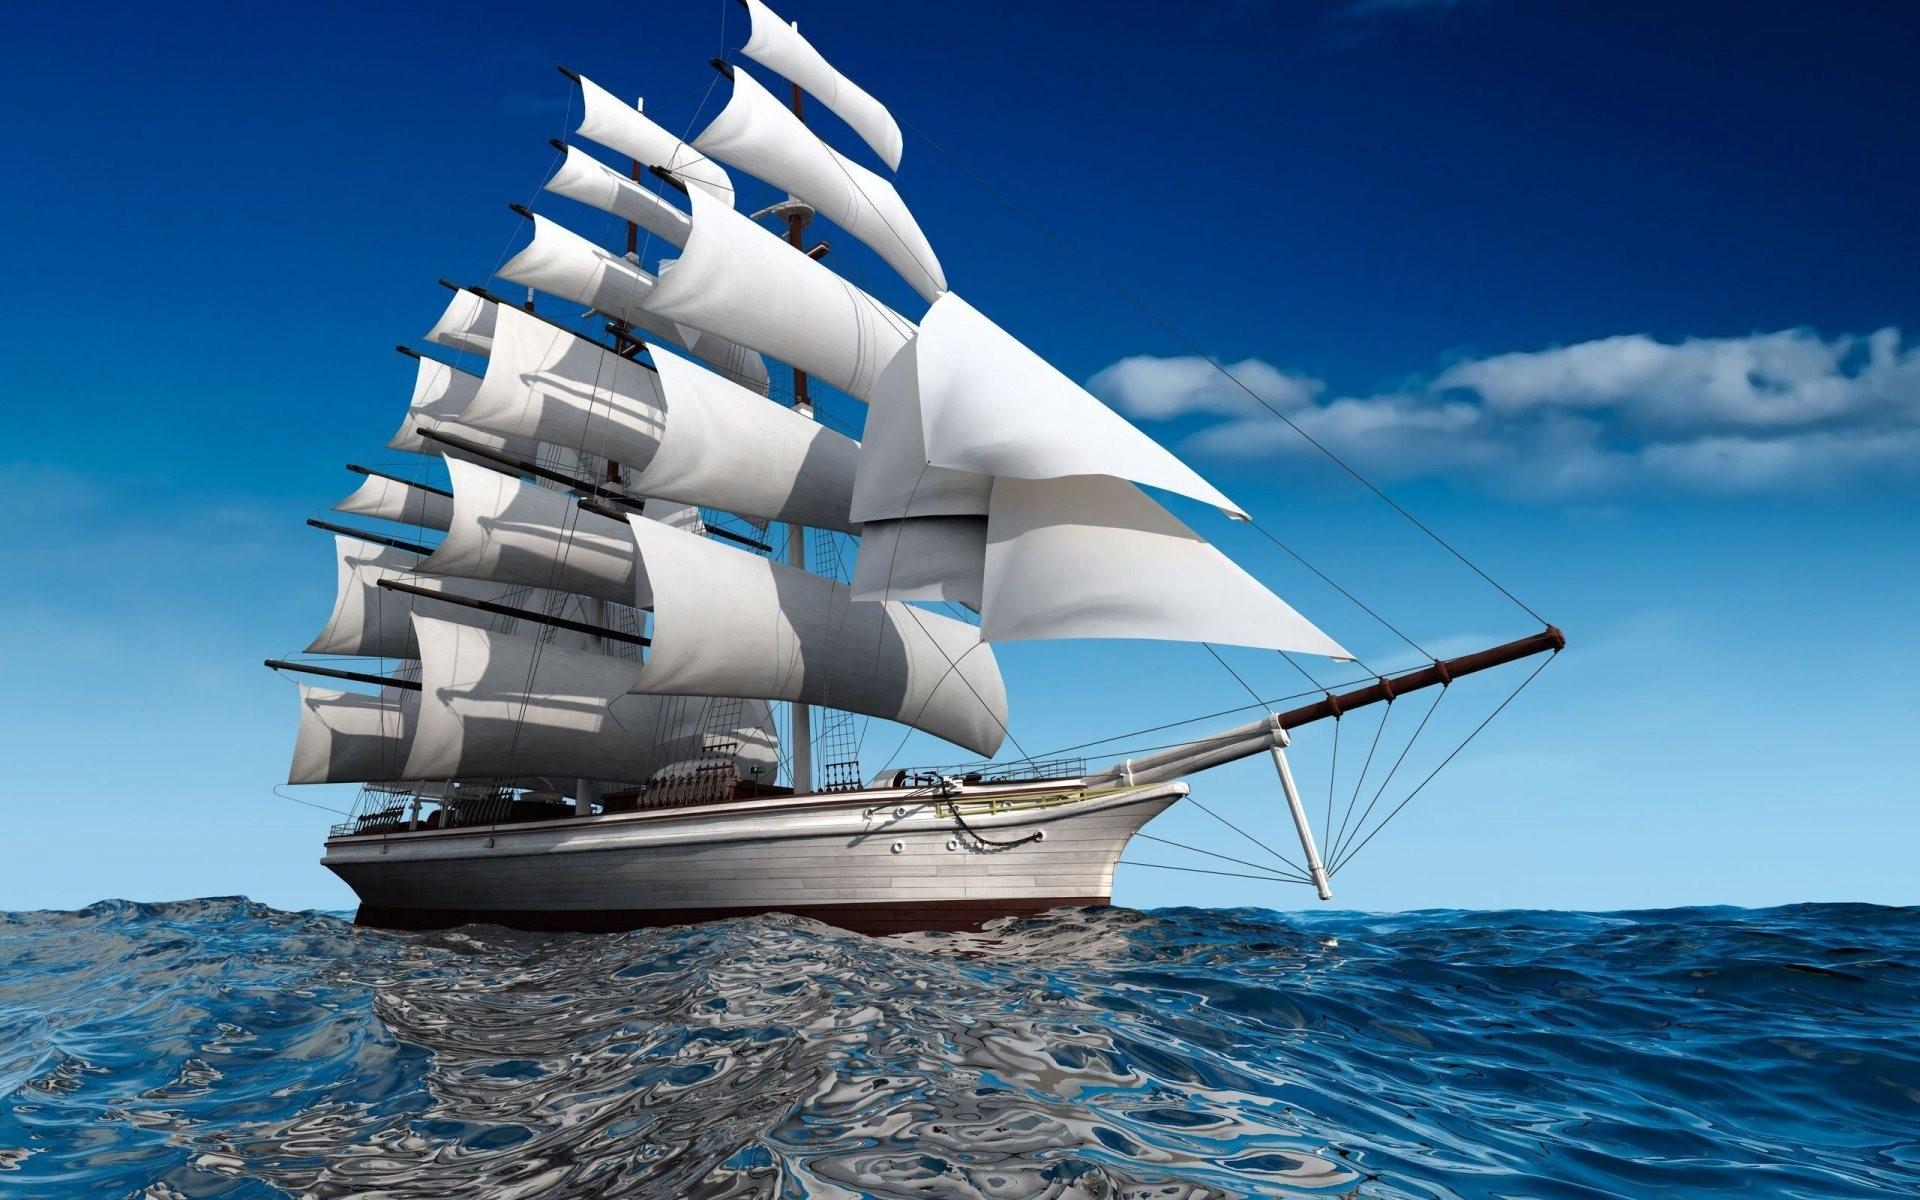 Big Sailing Ship | Full HD Desktop Wallpapers 1080p